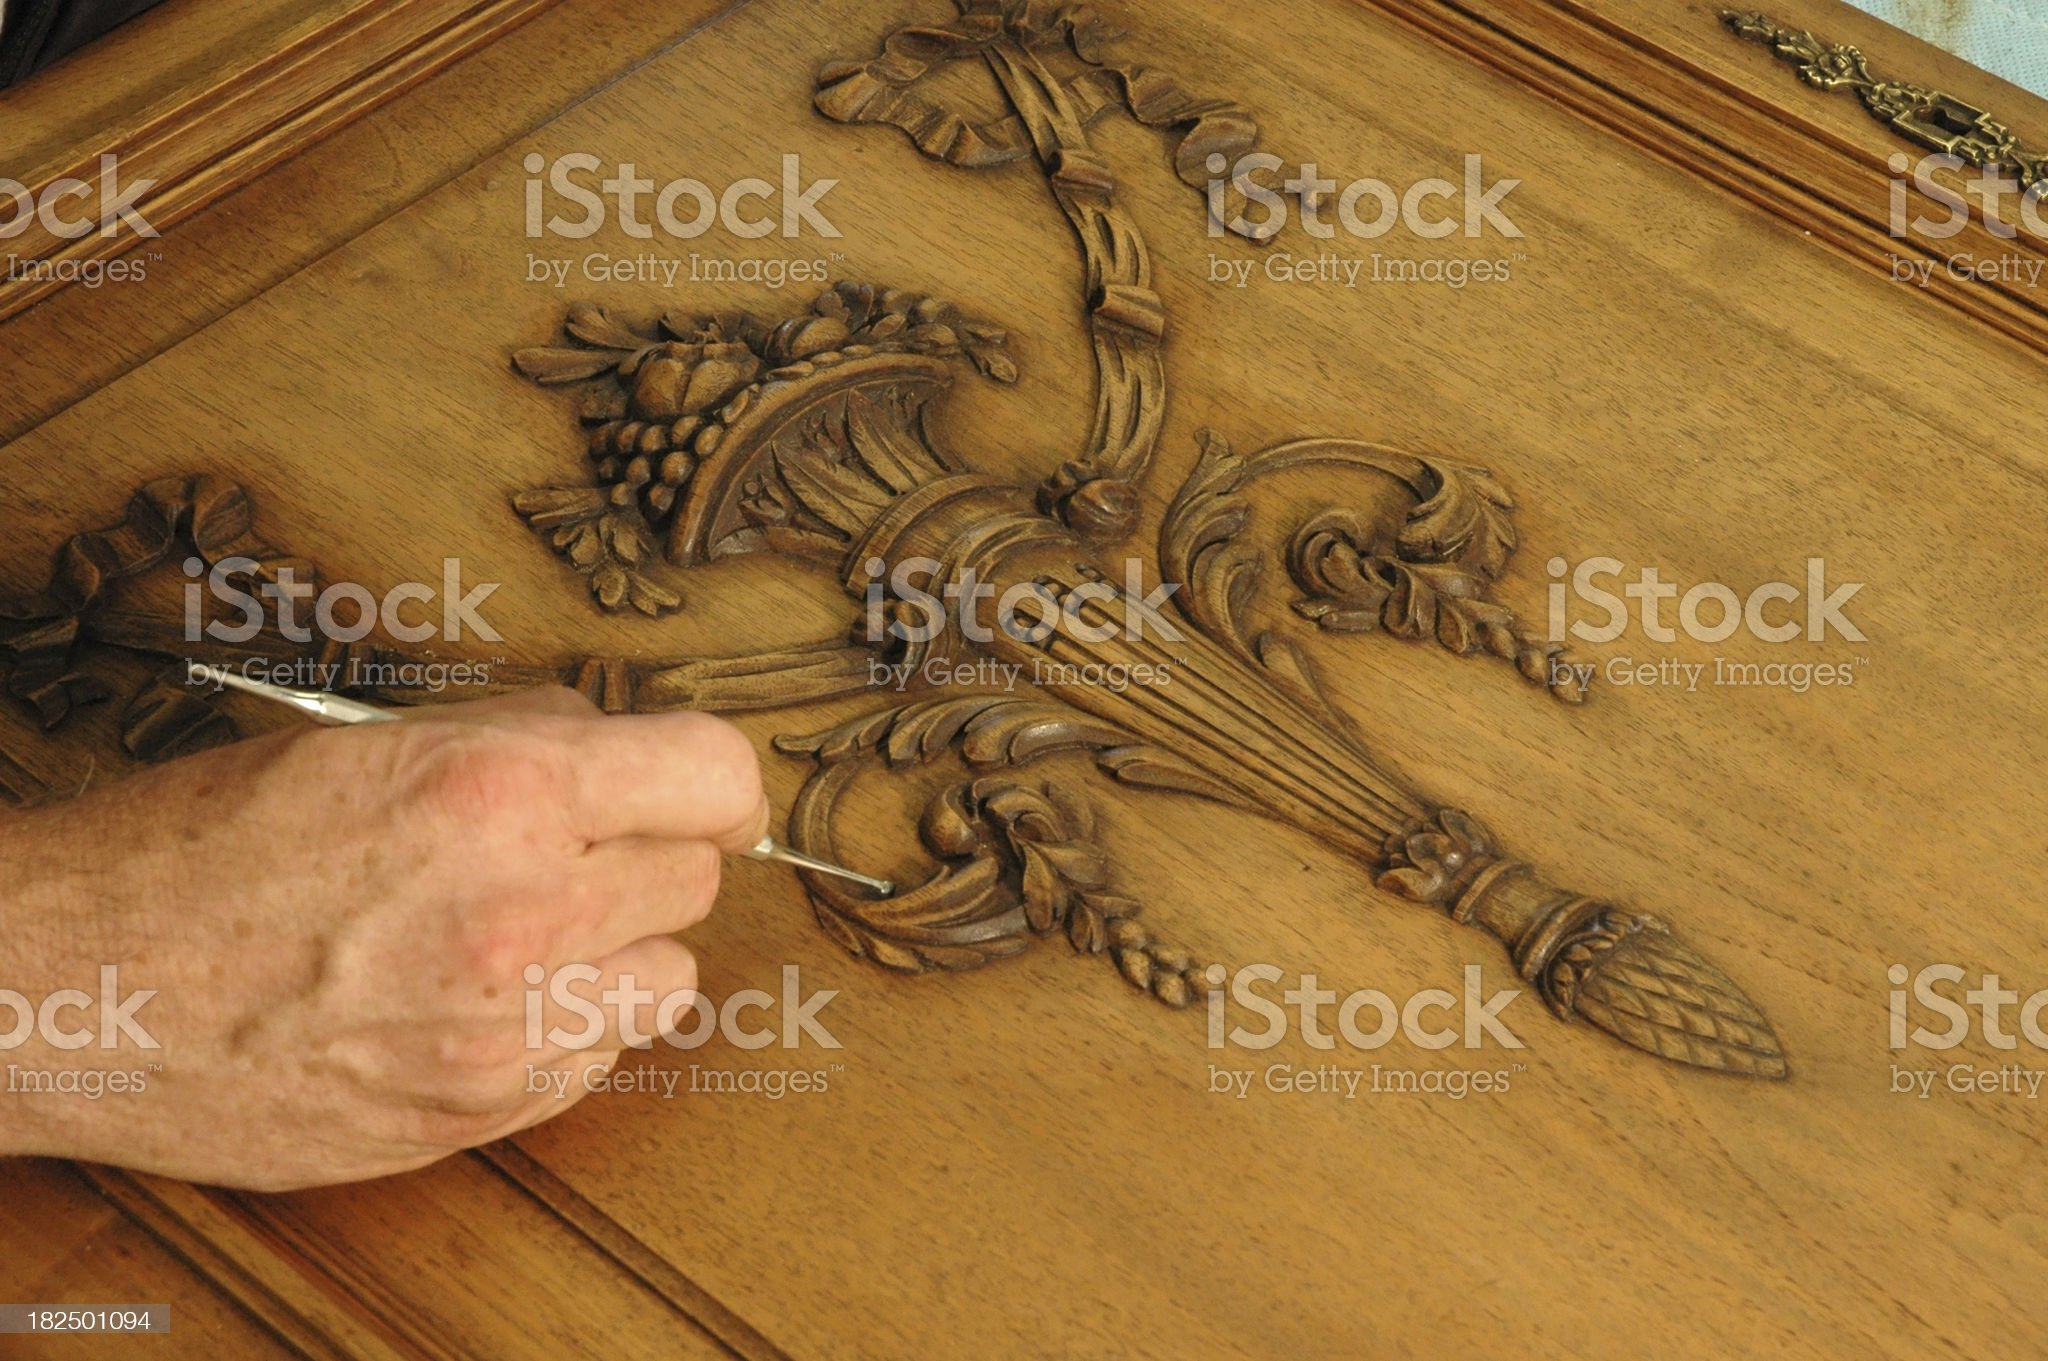 Wood worker repairing oak cabinet door royalty-free stock photo